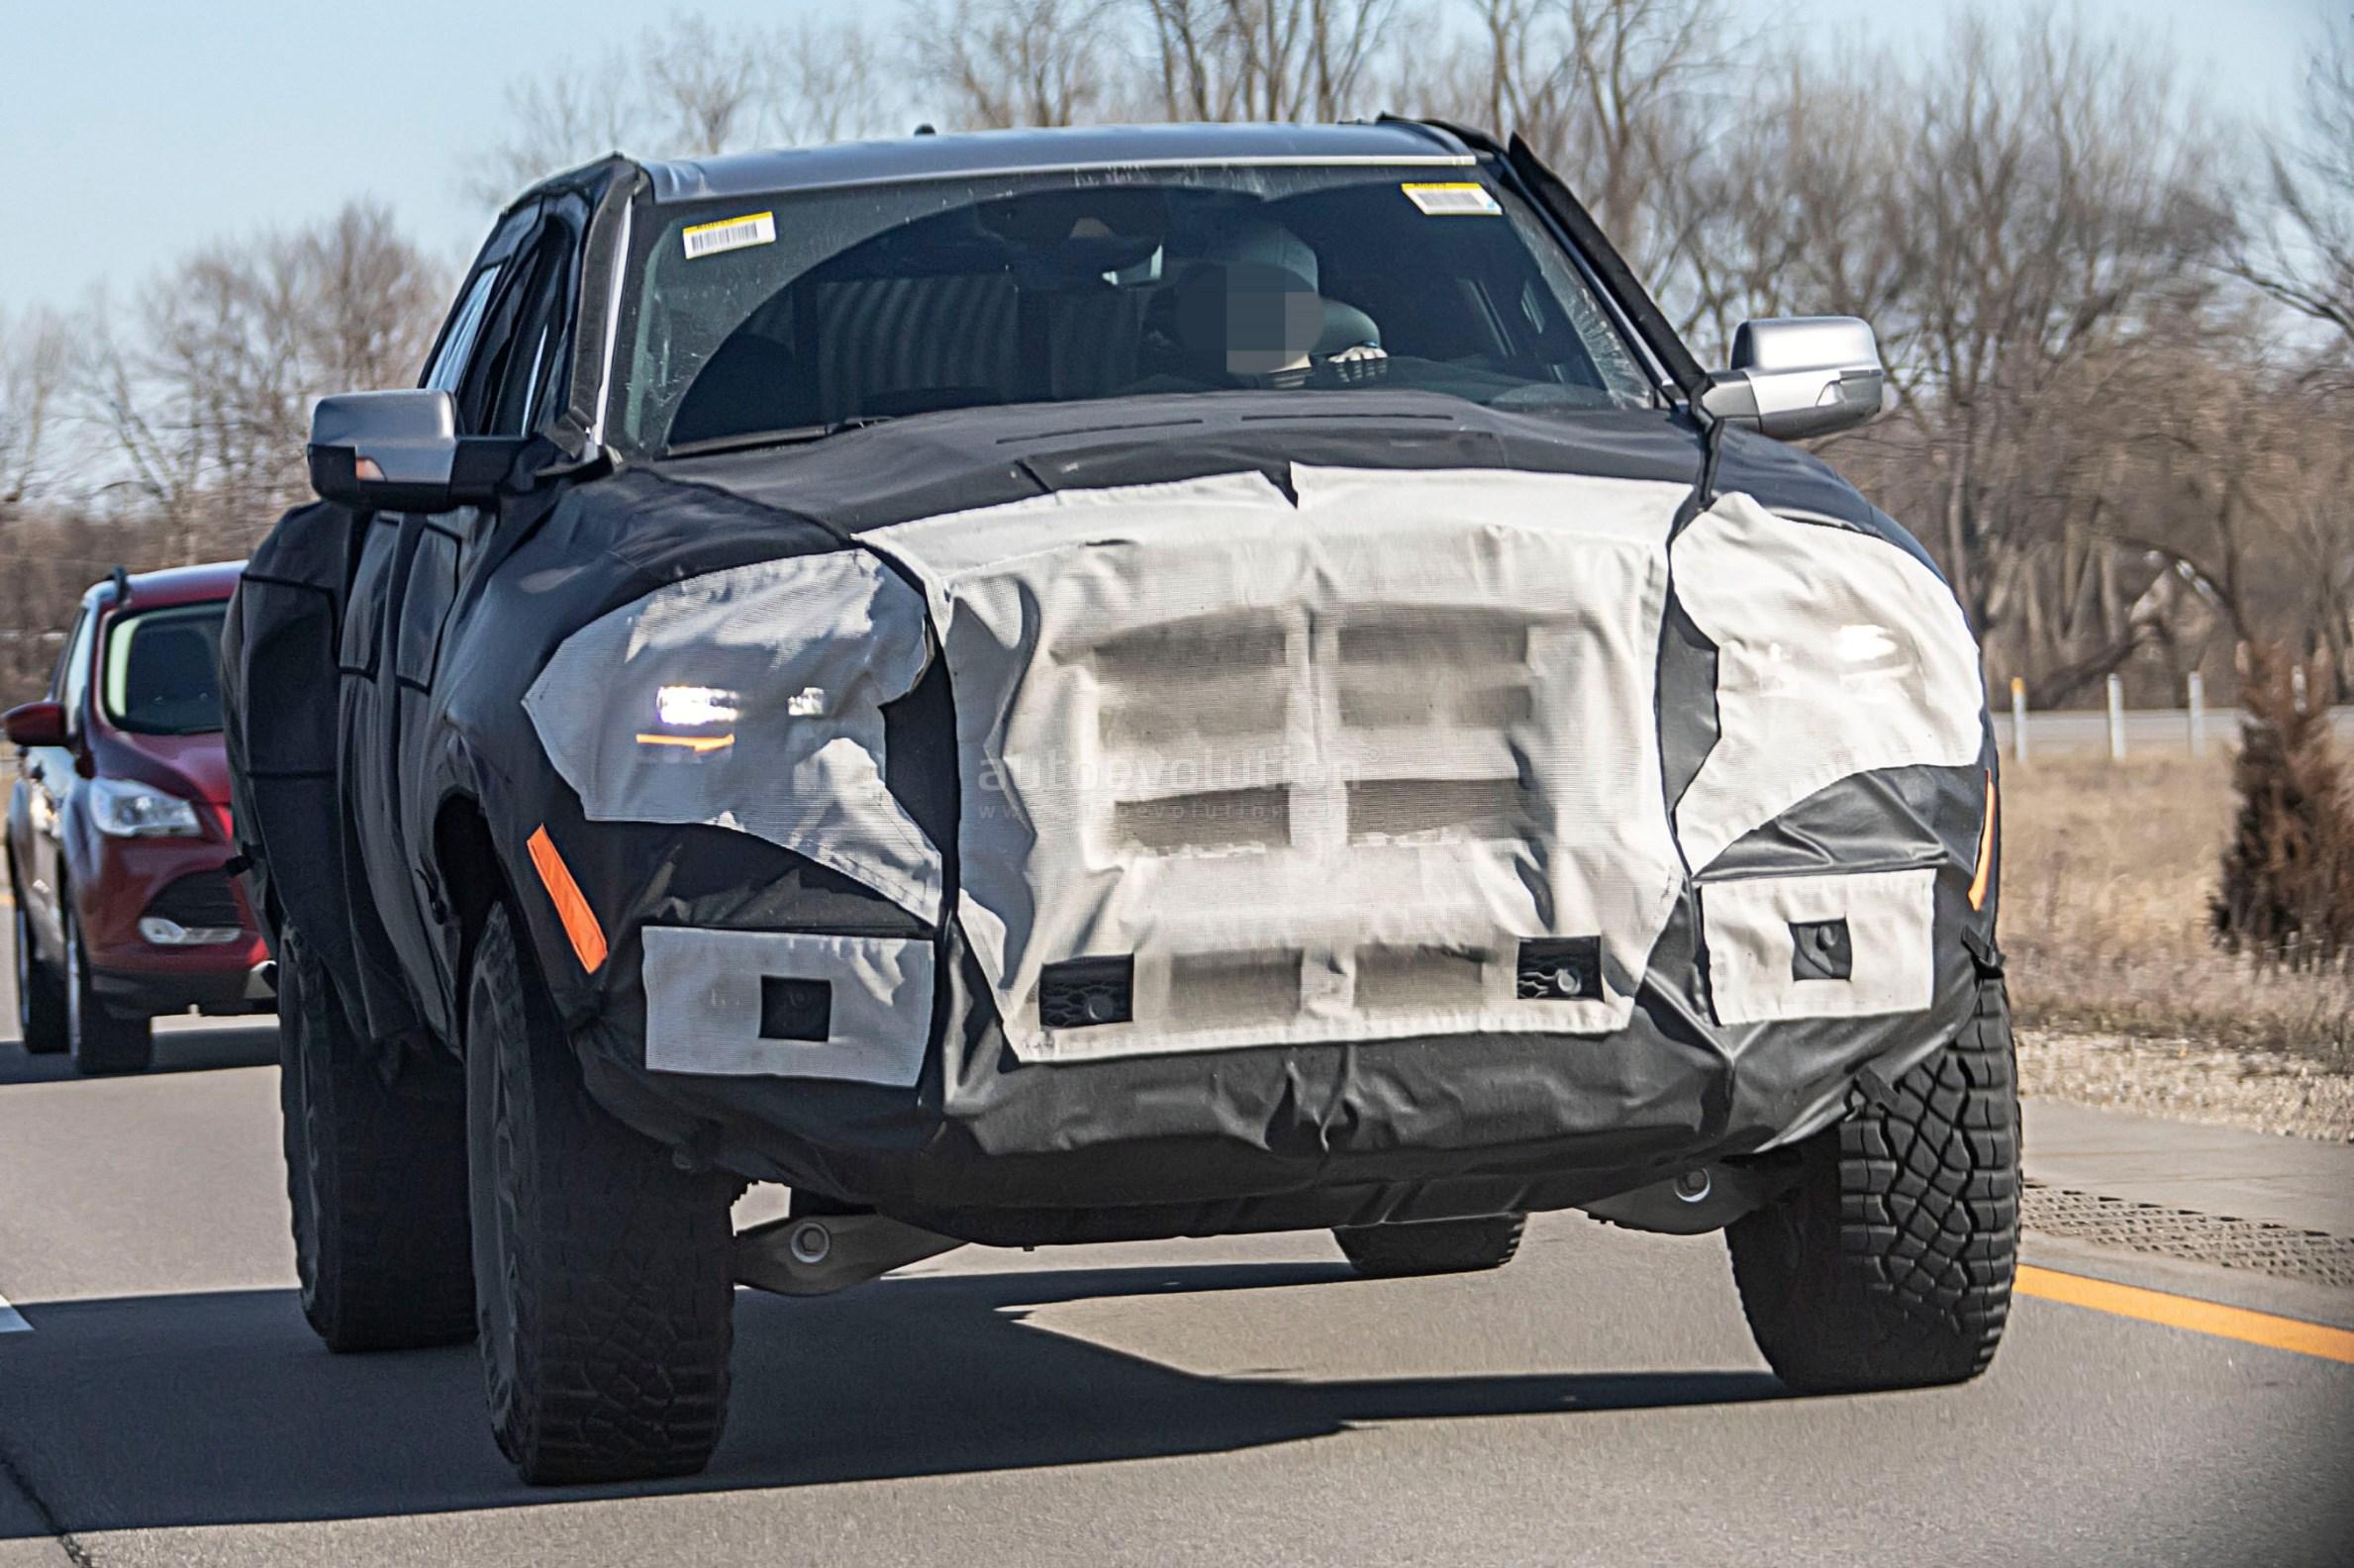 Ram 1500 Exhaust >> 2021 Ram 1500 Rebel TRX Spied With Goodyear Wrangler Off-Road Tires, Looks Big - autoevolution